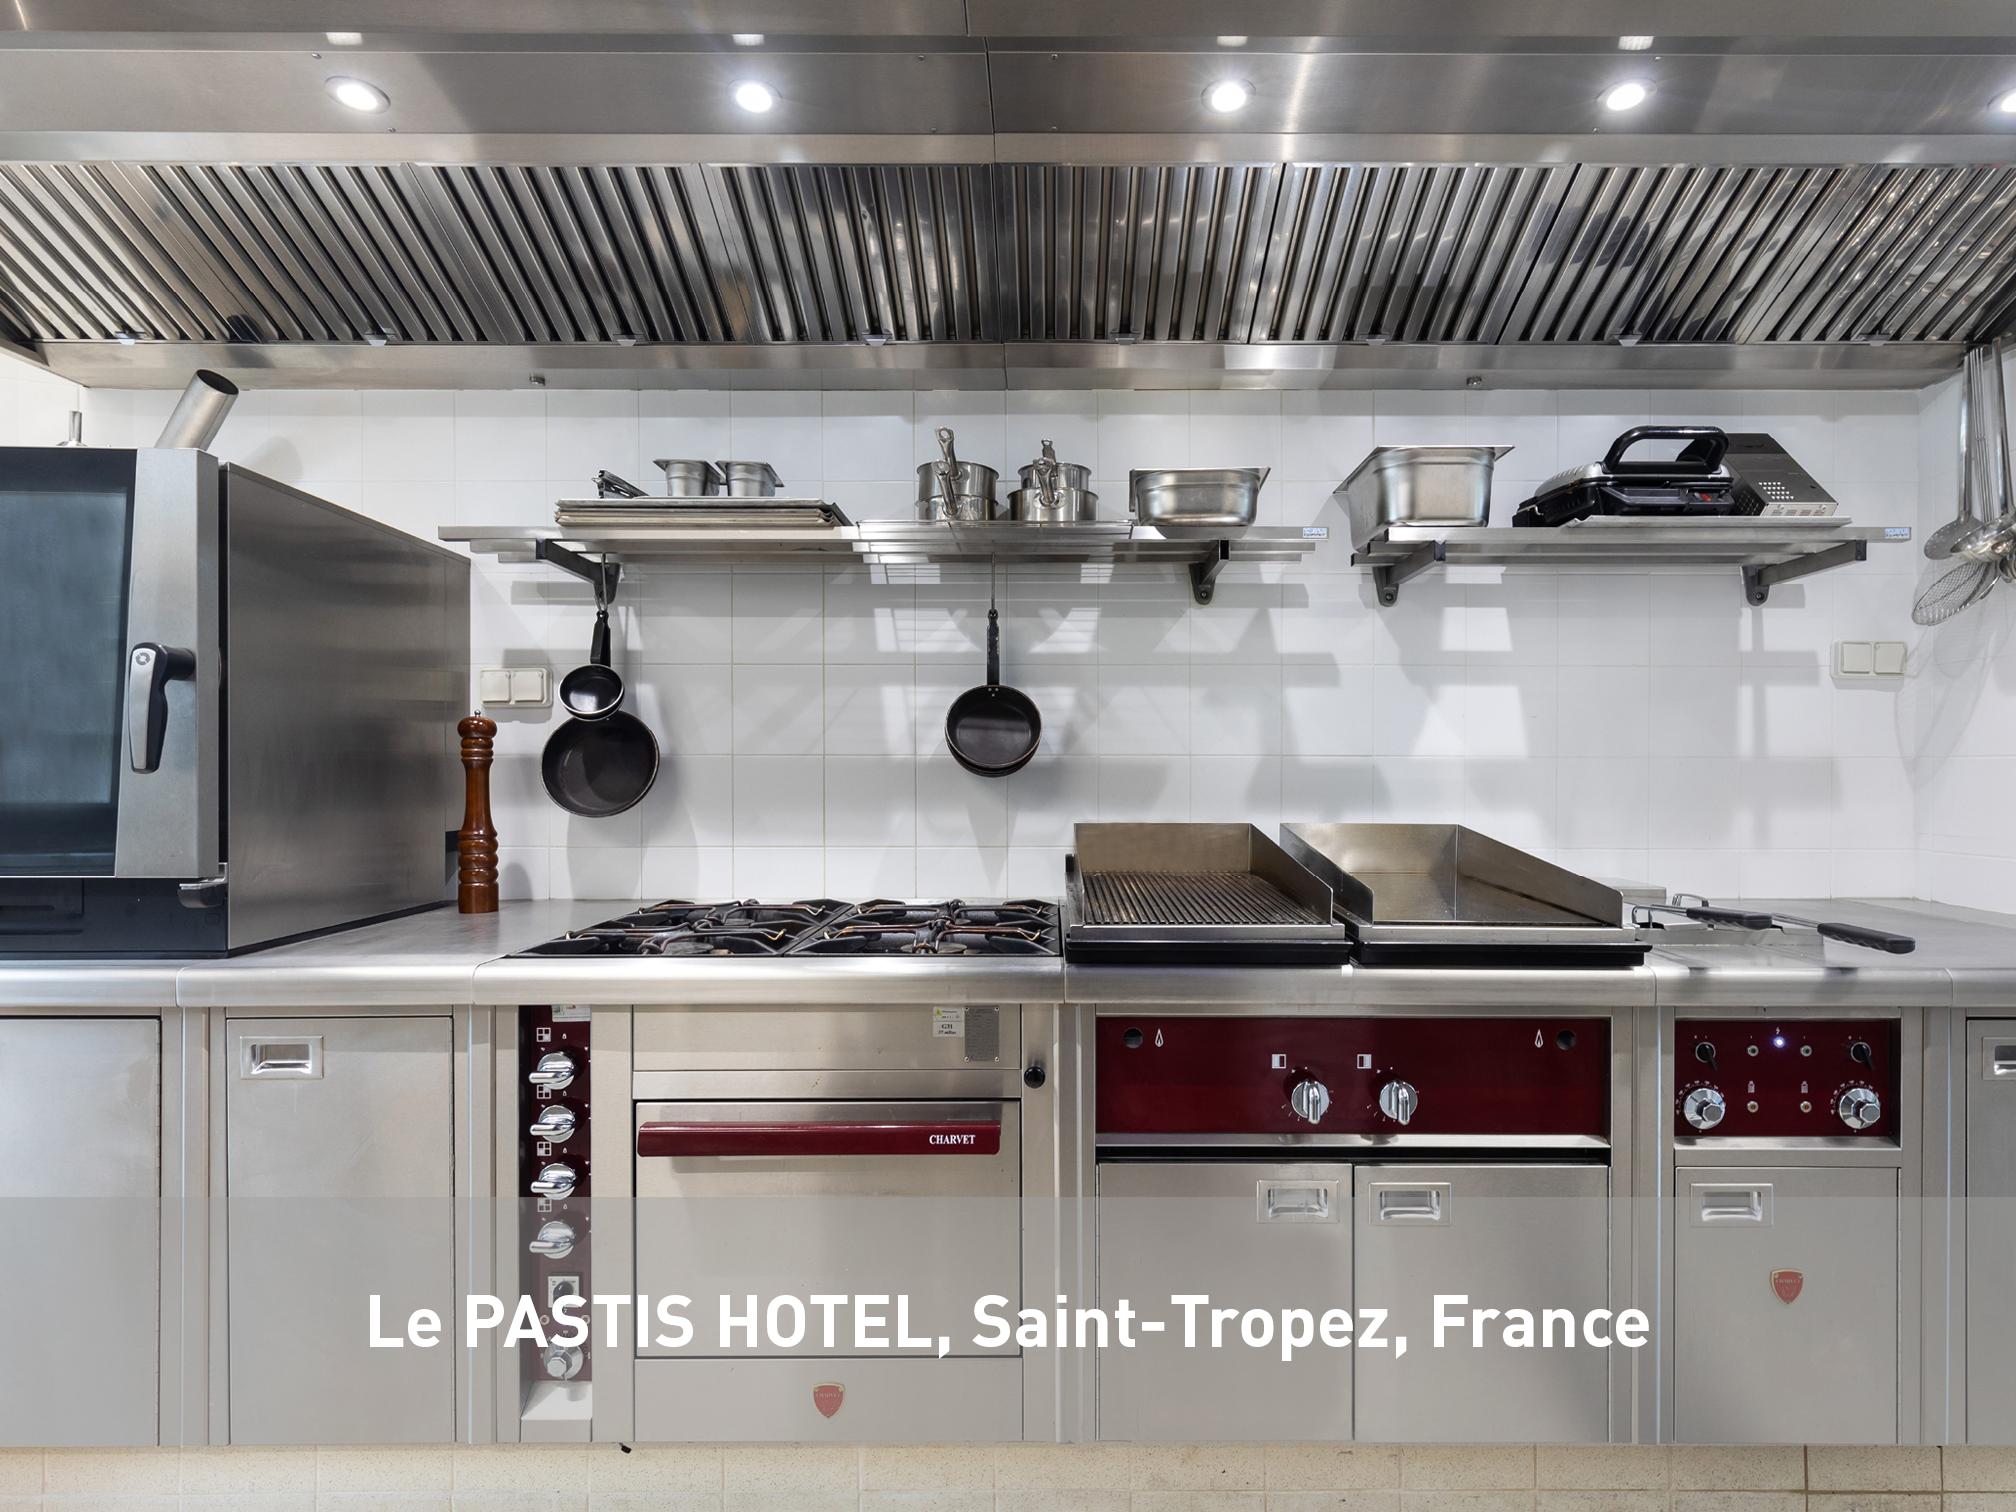 Le-Pastis-Hotel-Charvet-France